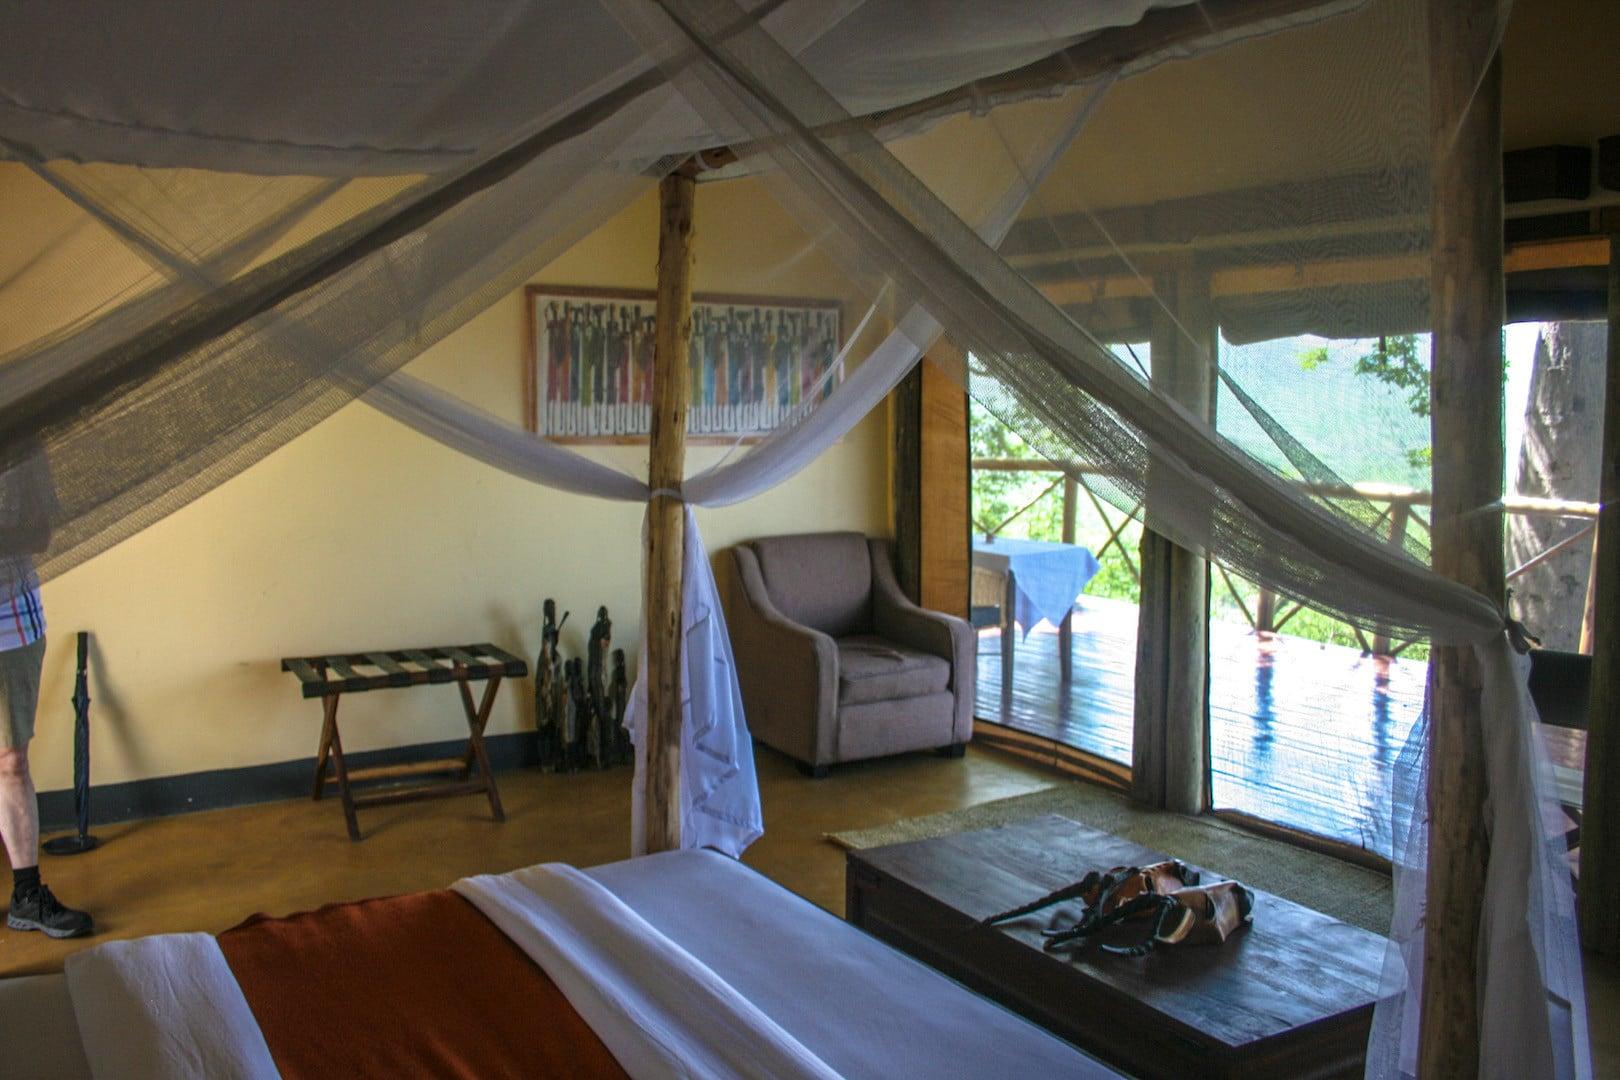 Family / Triple room & Luxury lodges in Arusha Tanzania